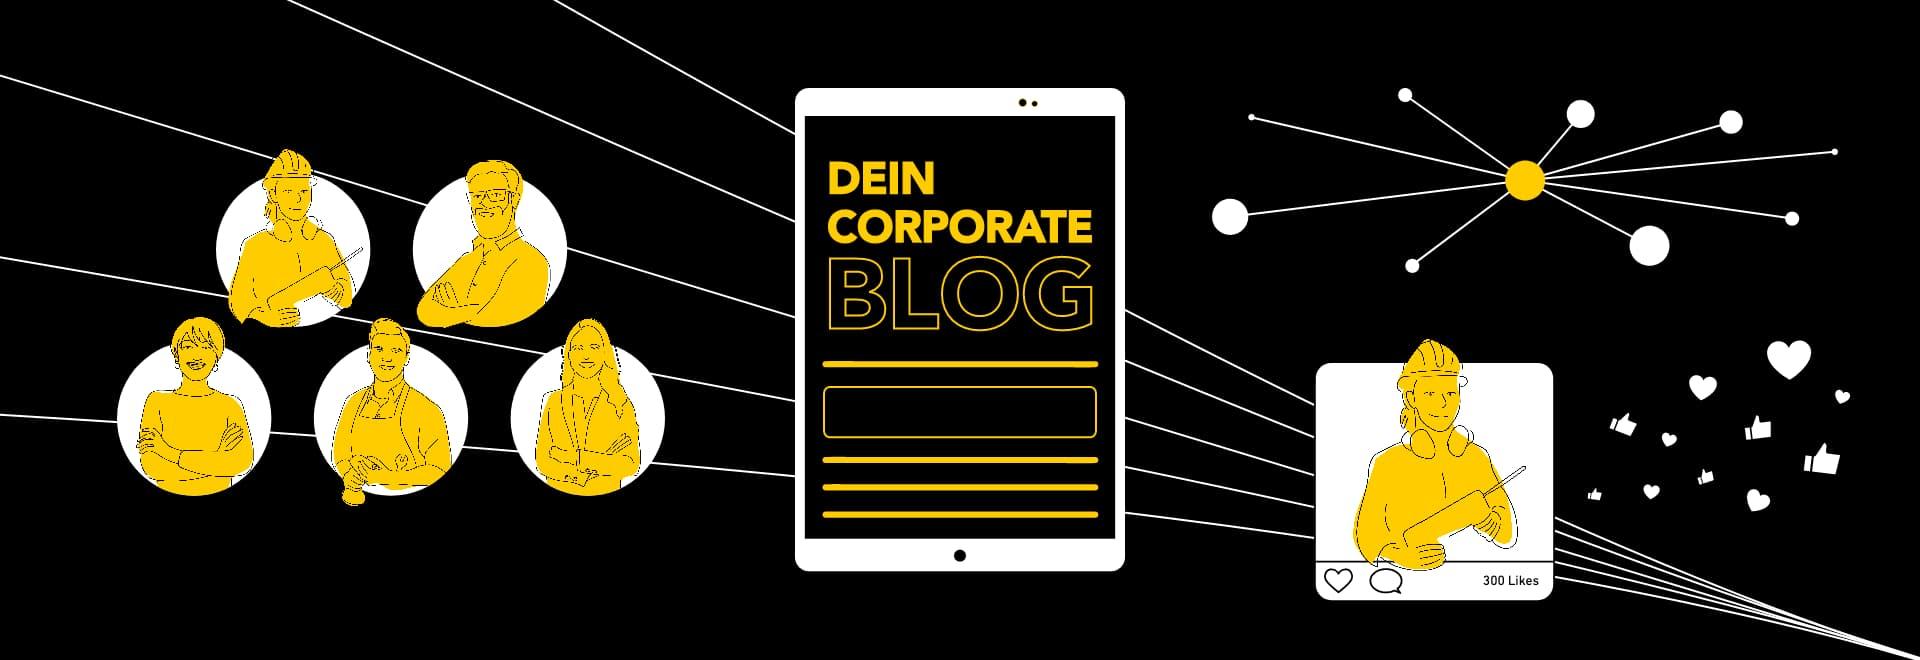 Abbildung: Corporate Blog als Grundlage für Social-Media-Kommunikation